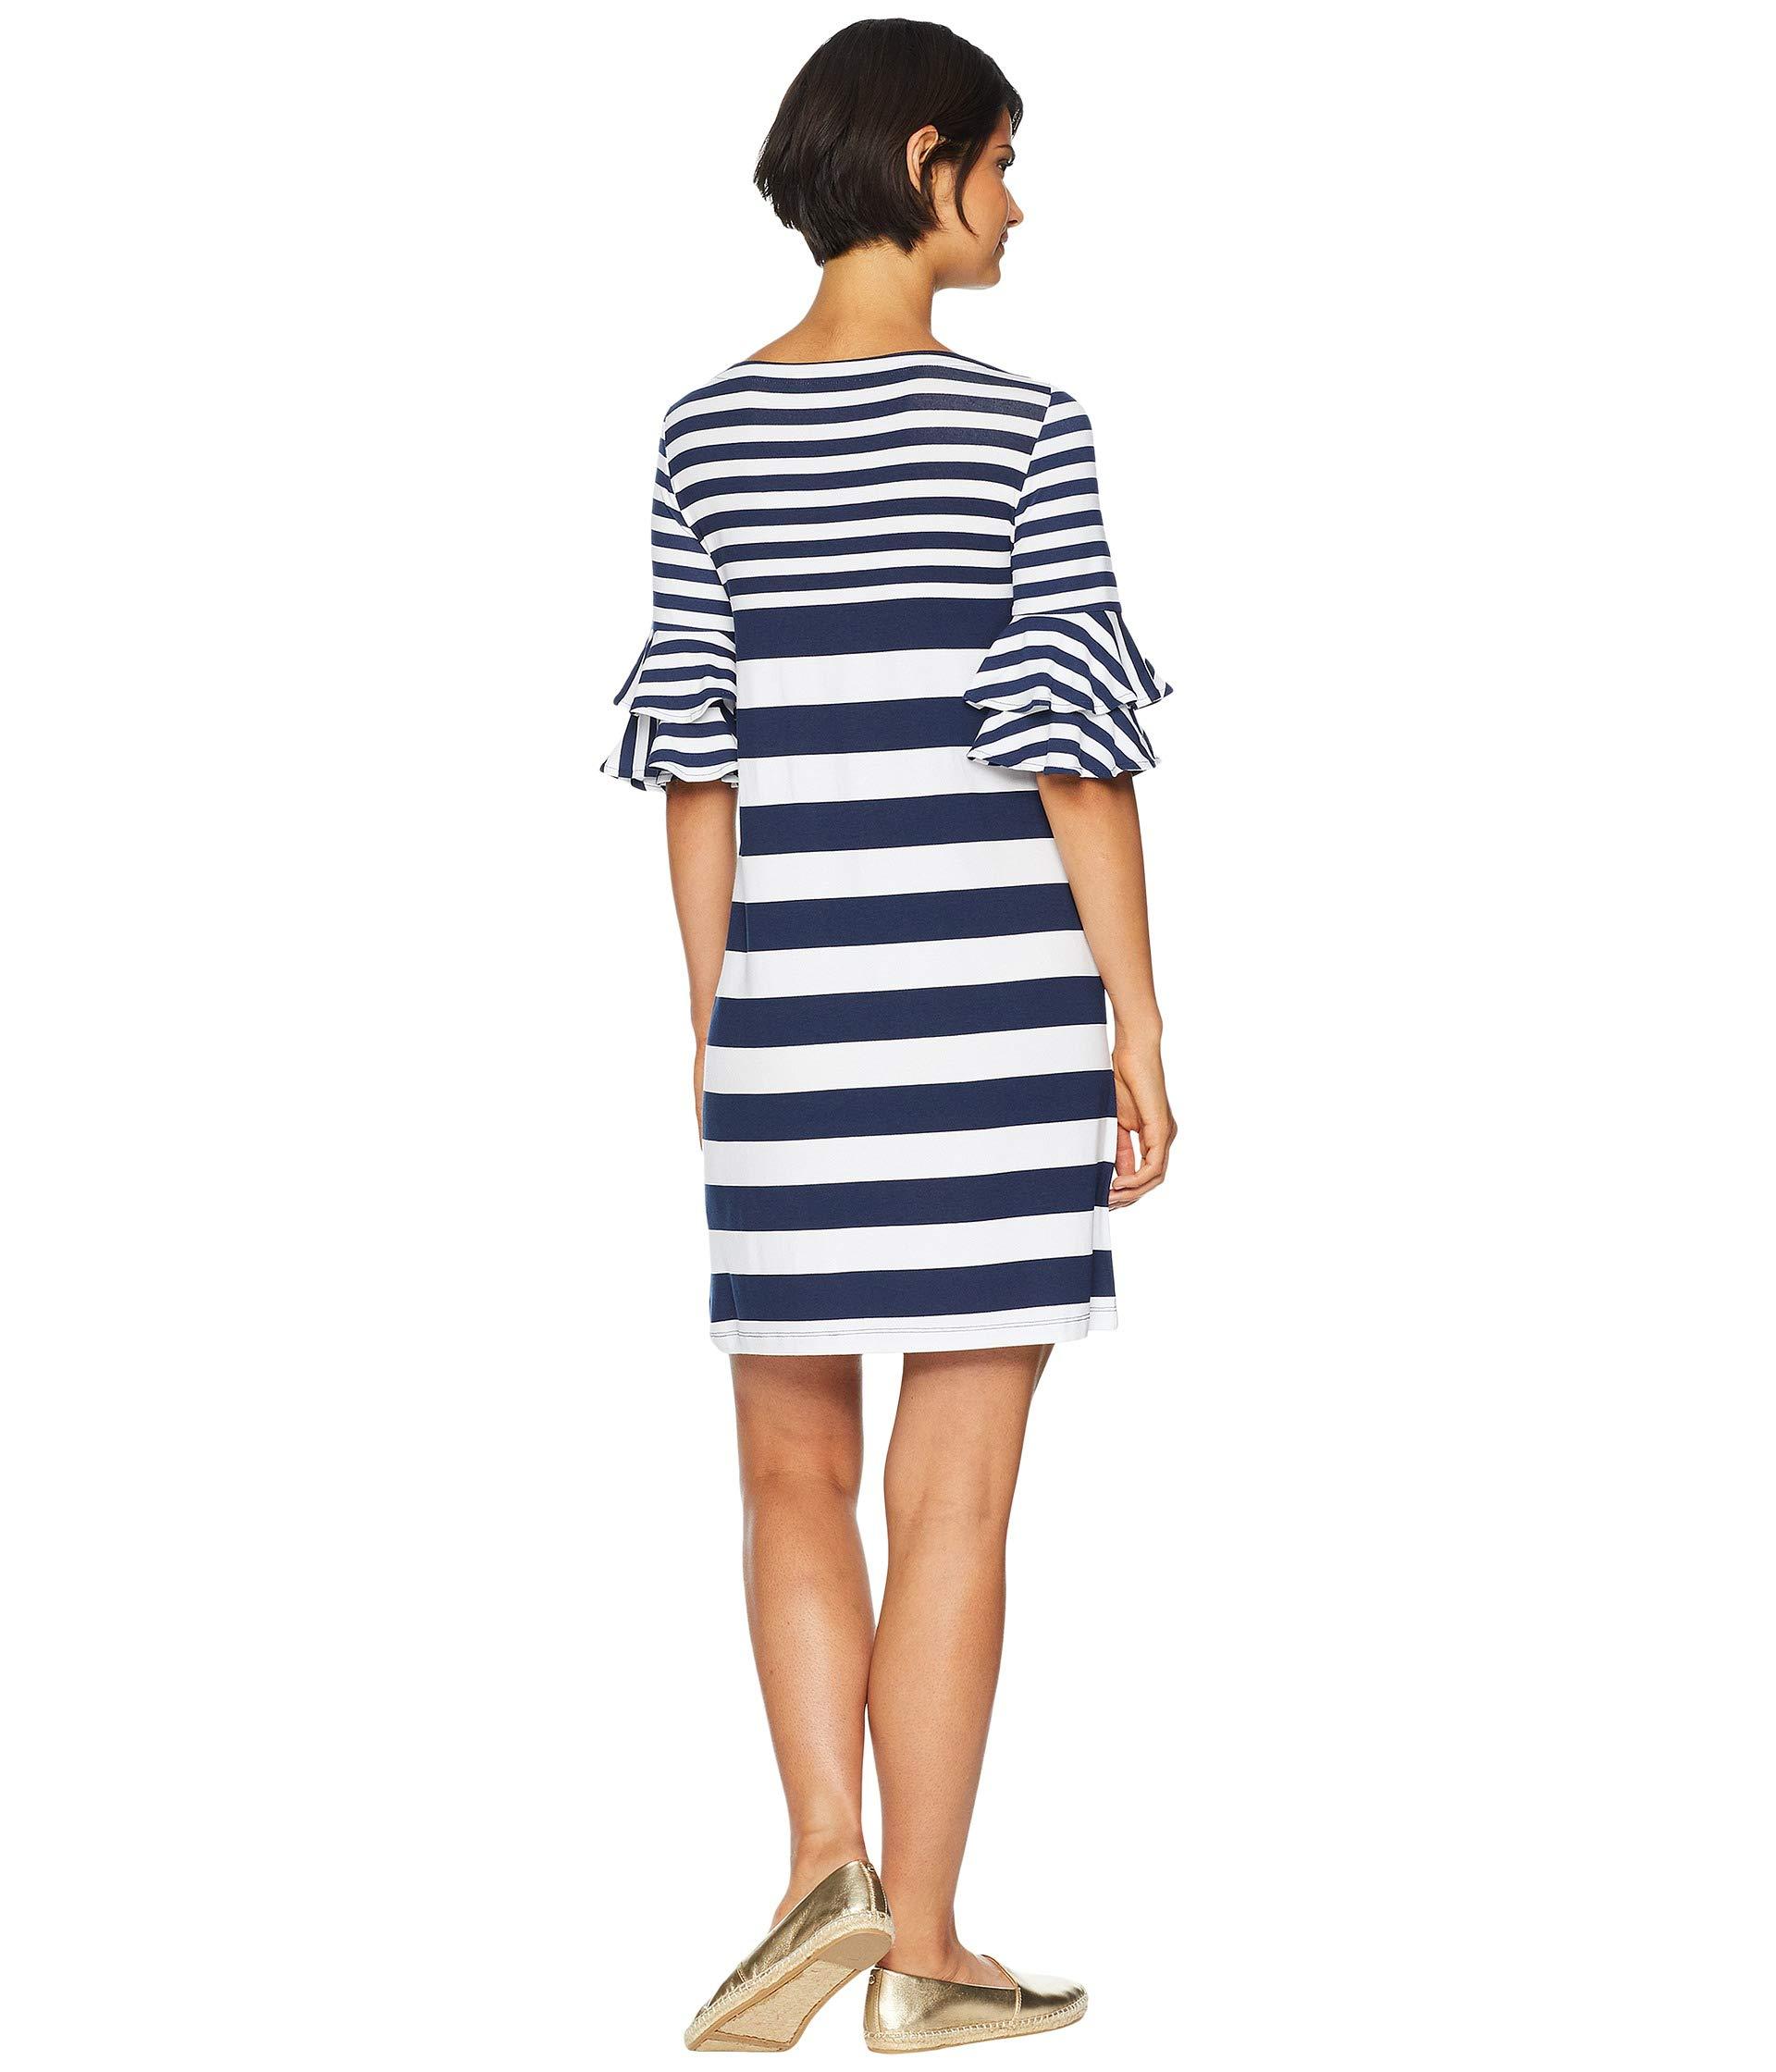 True Safari Dress Navy Lilly Up Eng Pulitzer Lula Stripe Pop wtqWF4